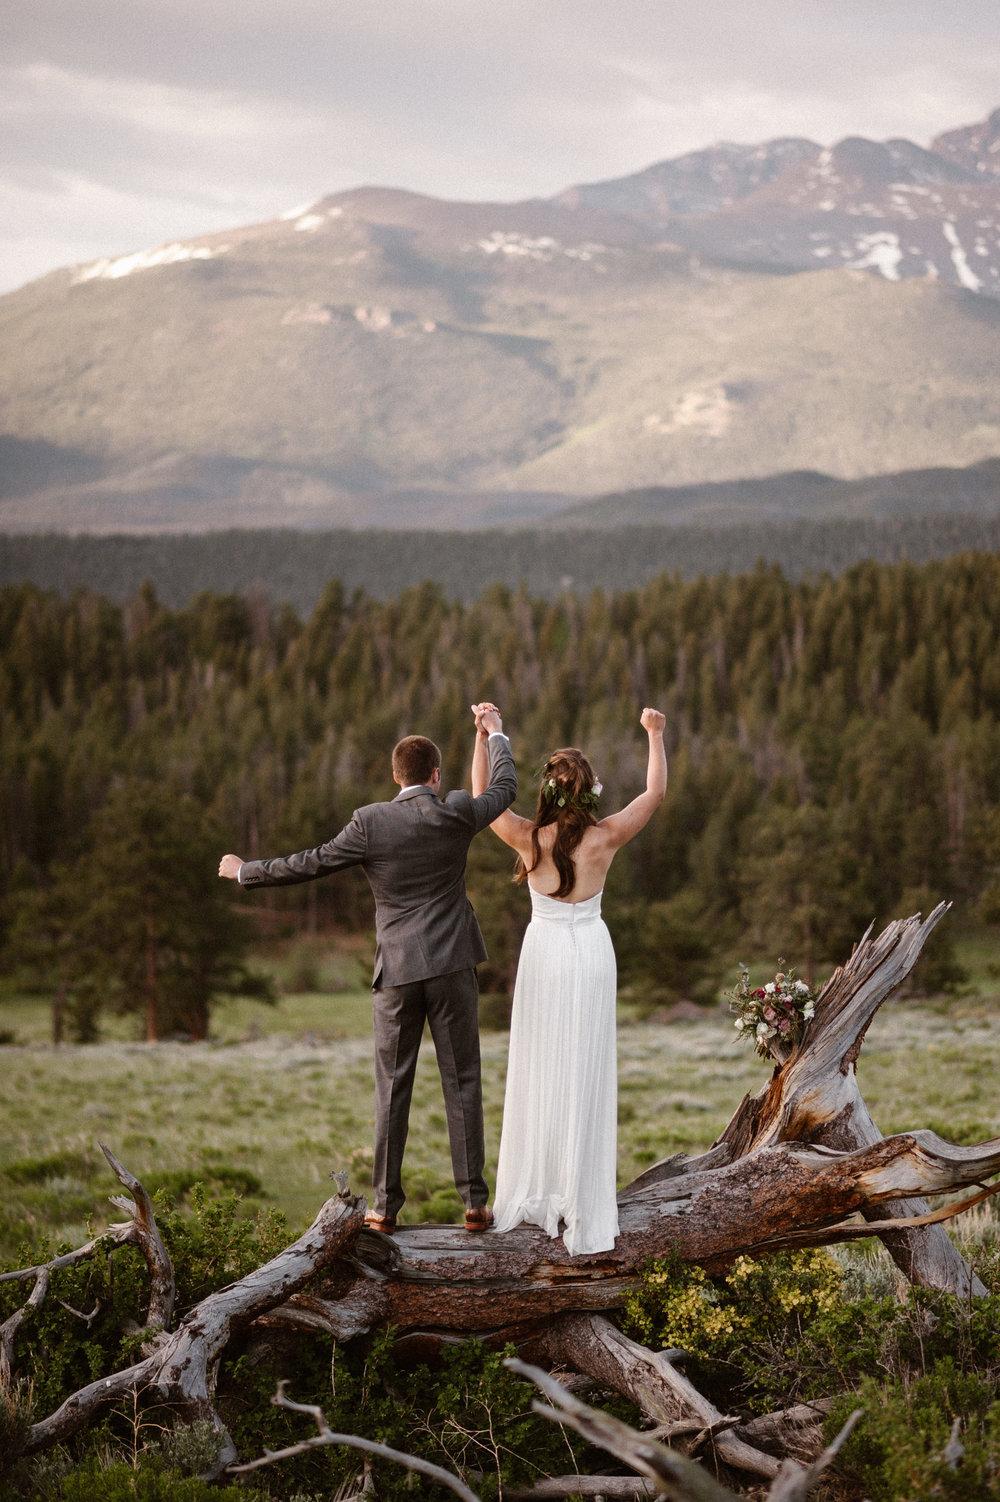 colorado-elopement-photographer-maddie-mae-adventure-wedding-photographer-intimate-wedding-photographer-adventurous-elopement-locations-14.jpg